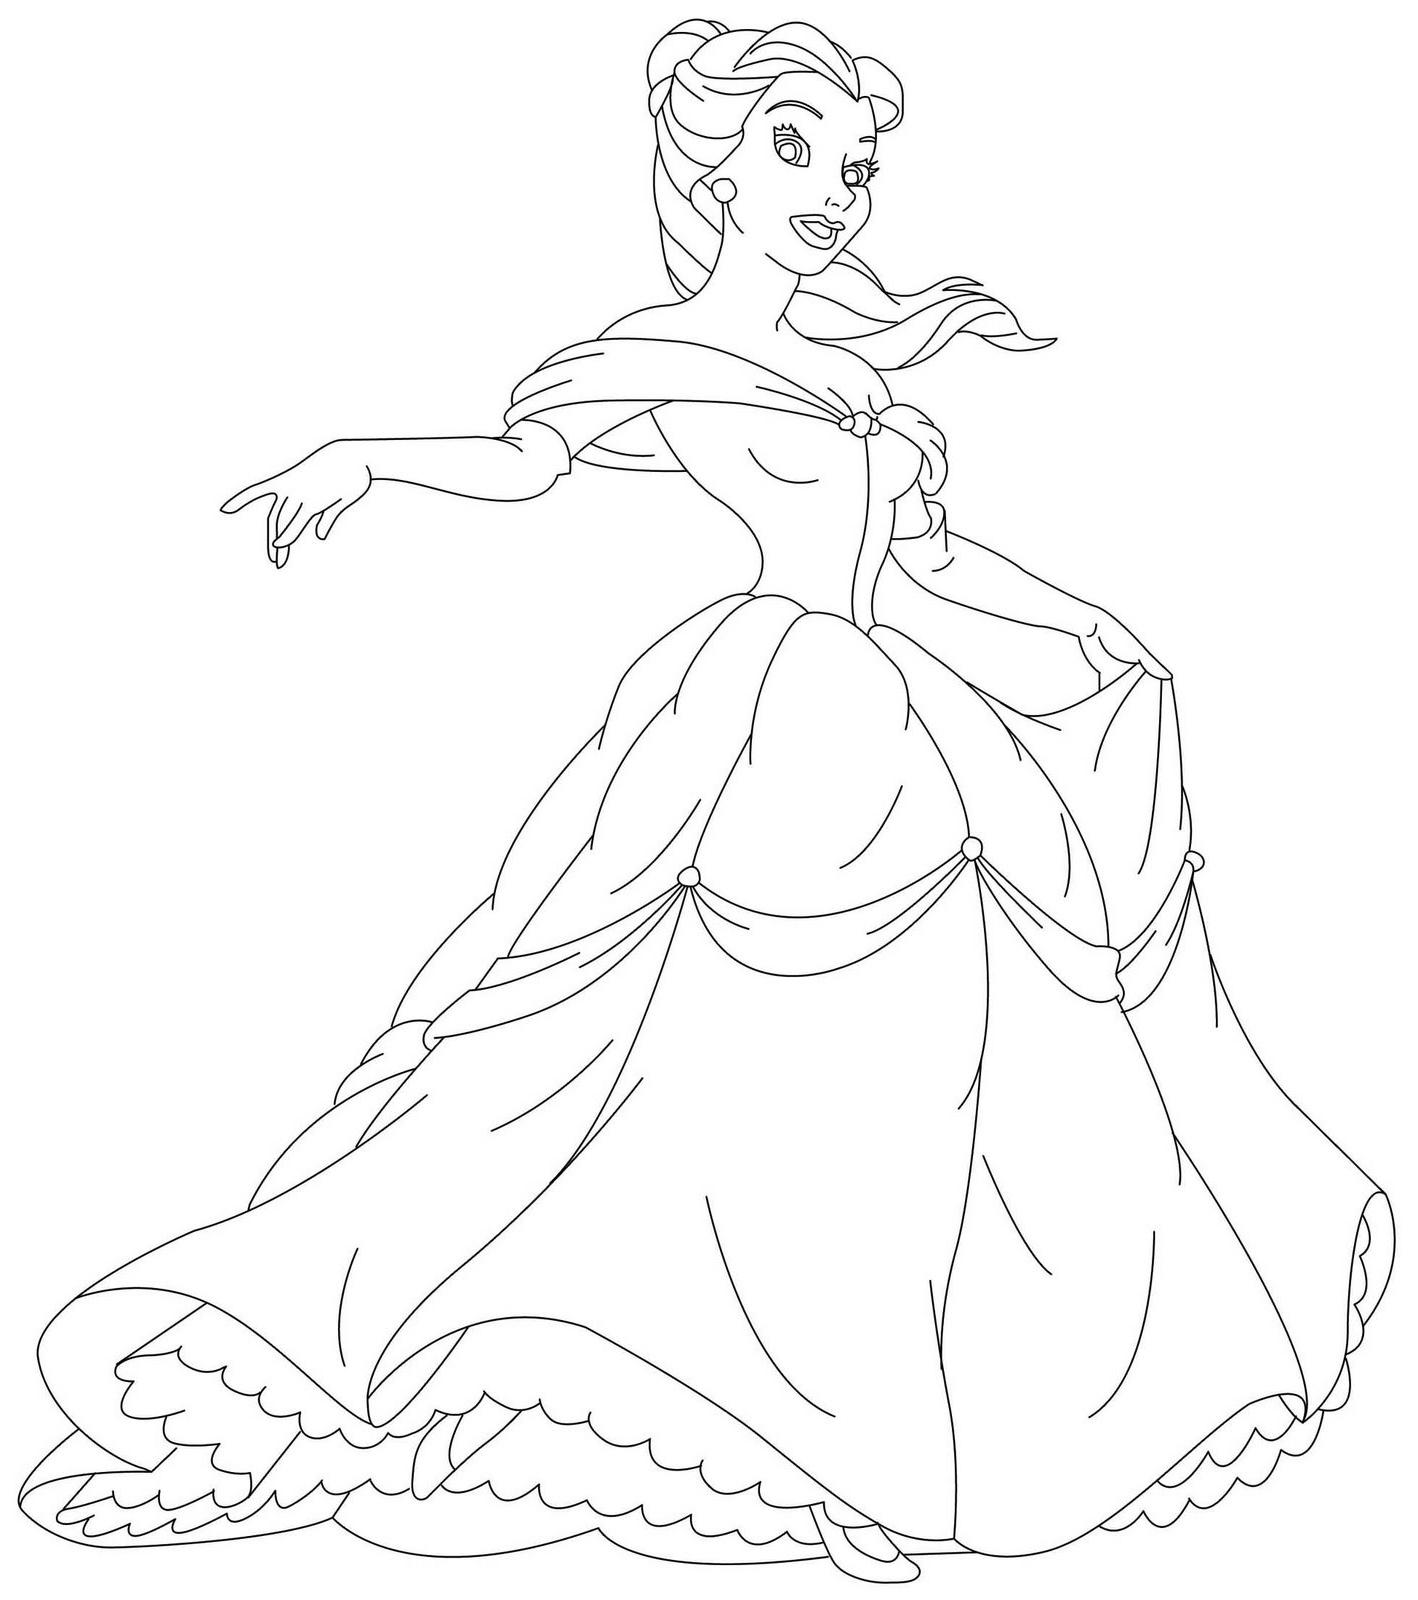 Disney princesses coloring pages kidsuki, disney princess coloring pages